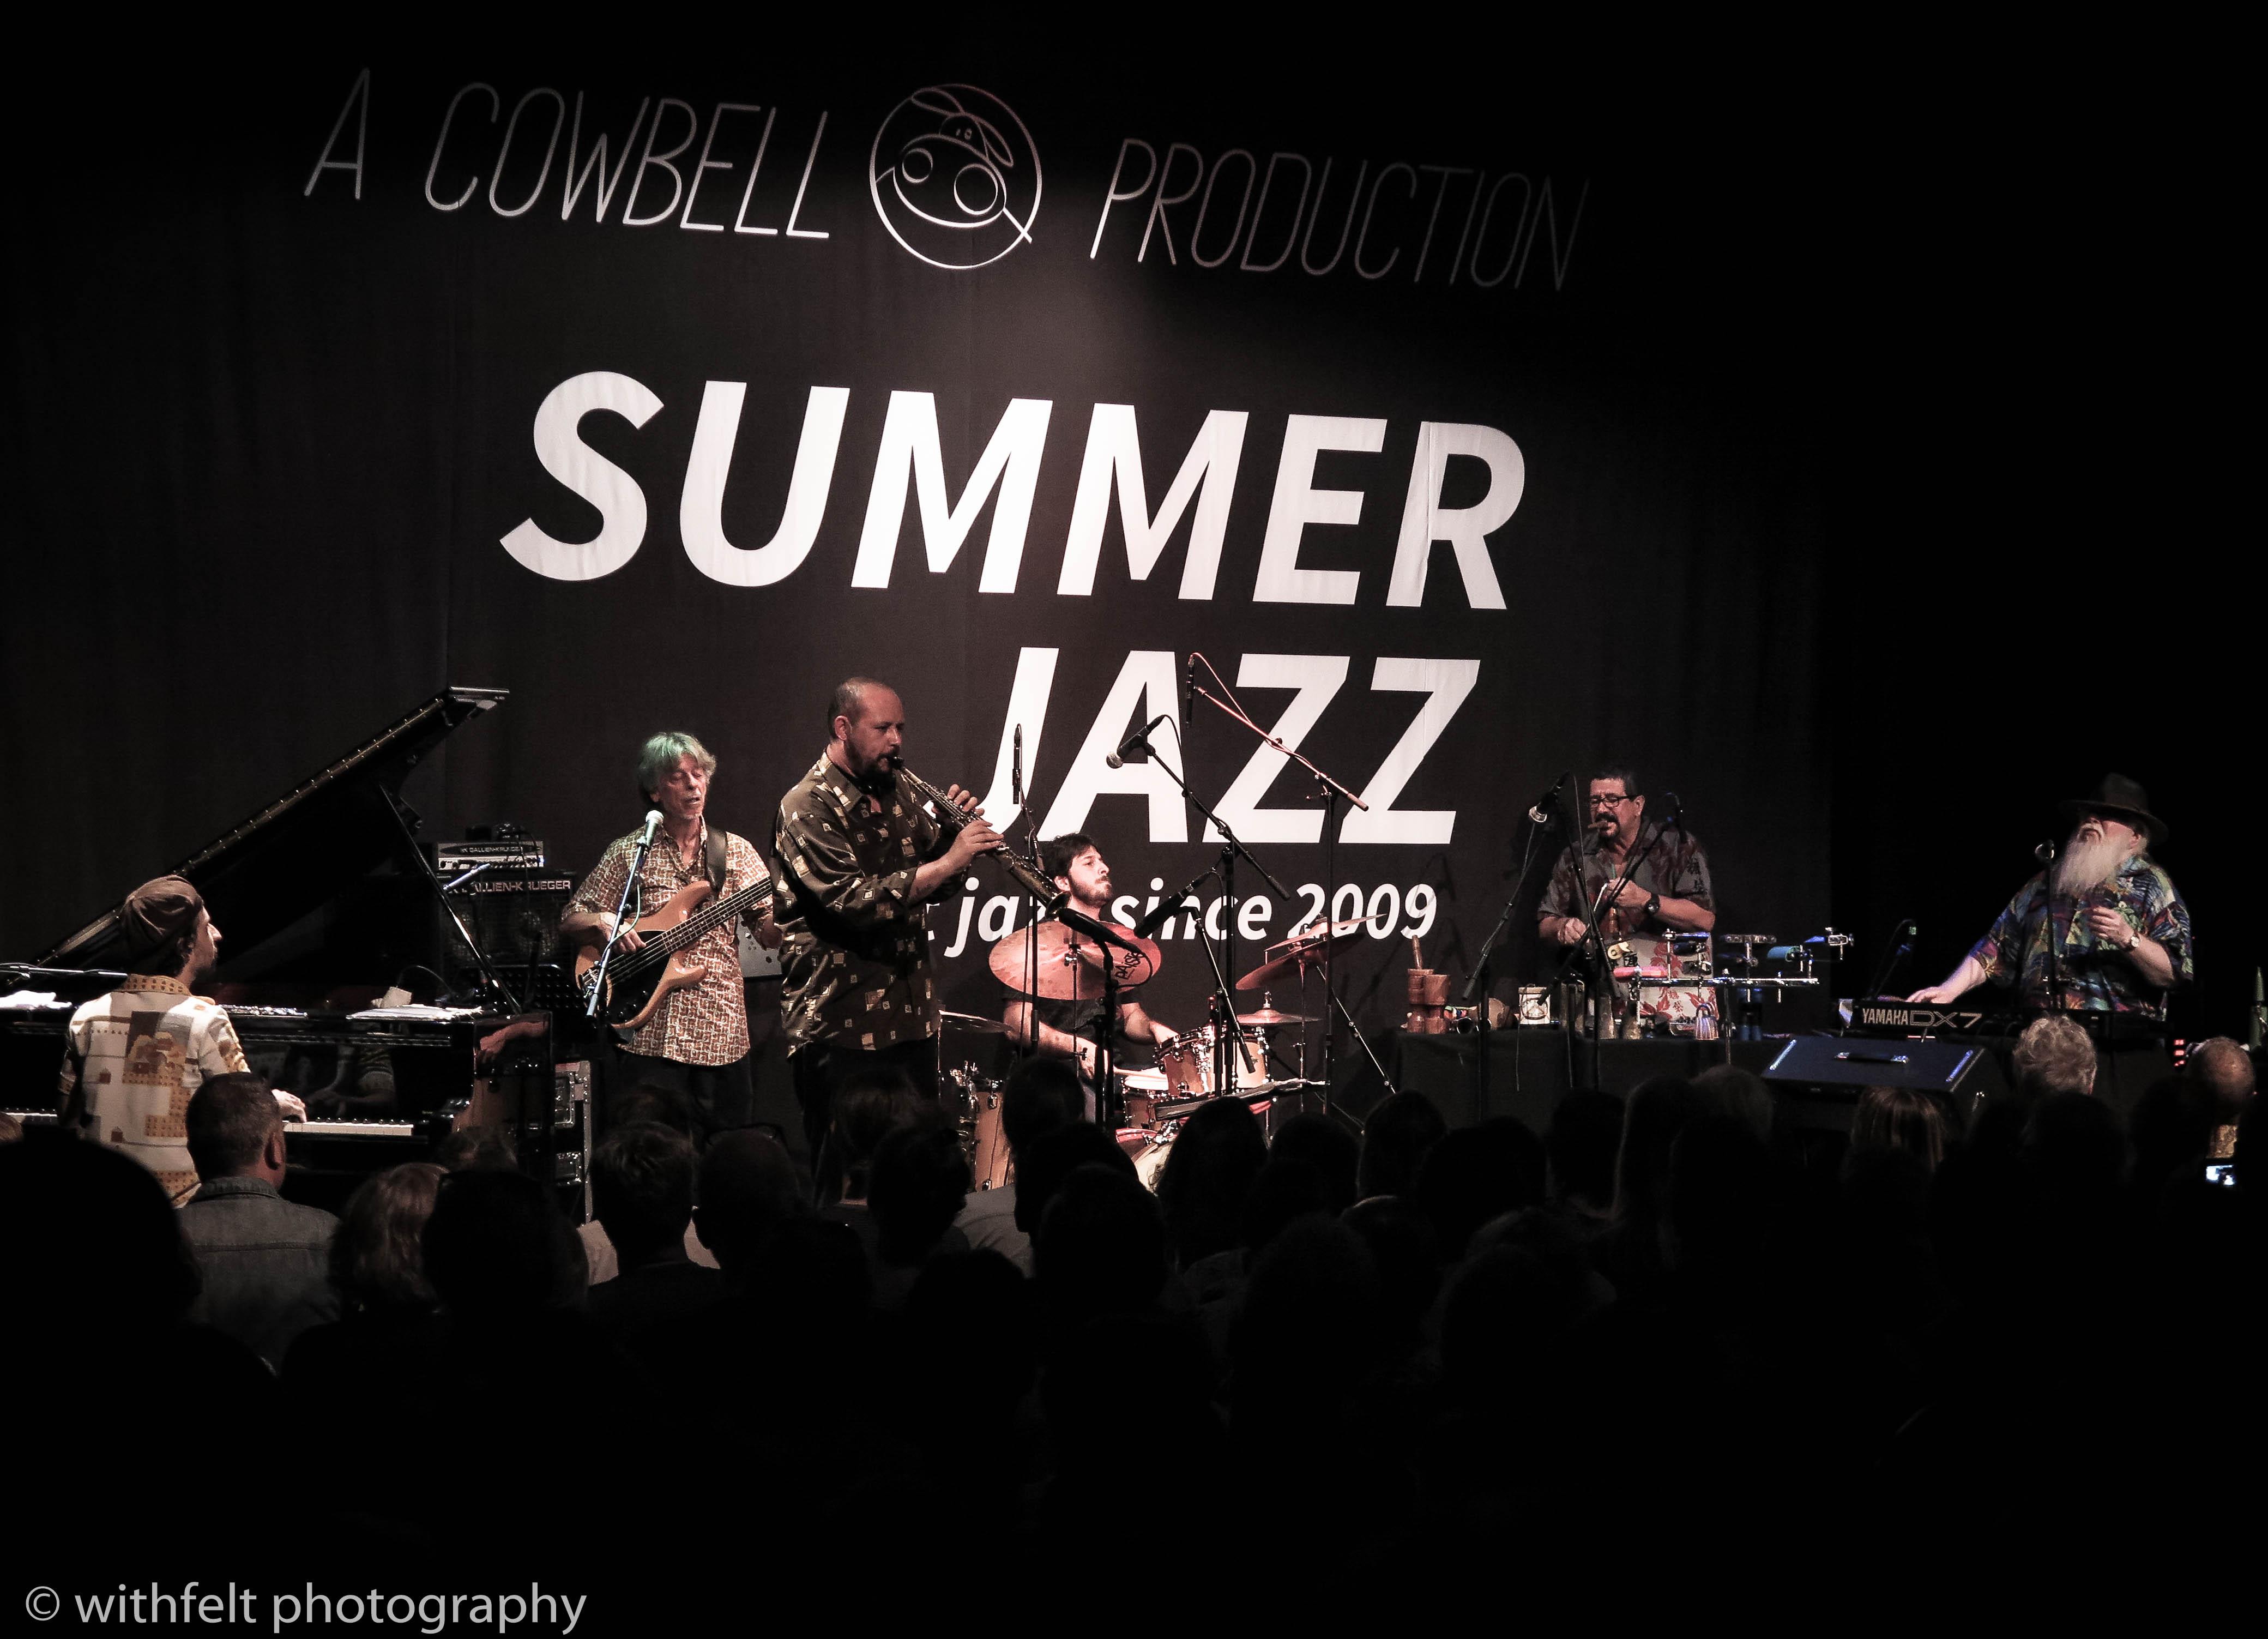 Hermeto Pascoal e Grupo at Summer Jazz 2018 in Copenhagen